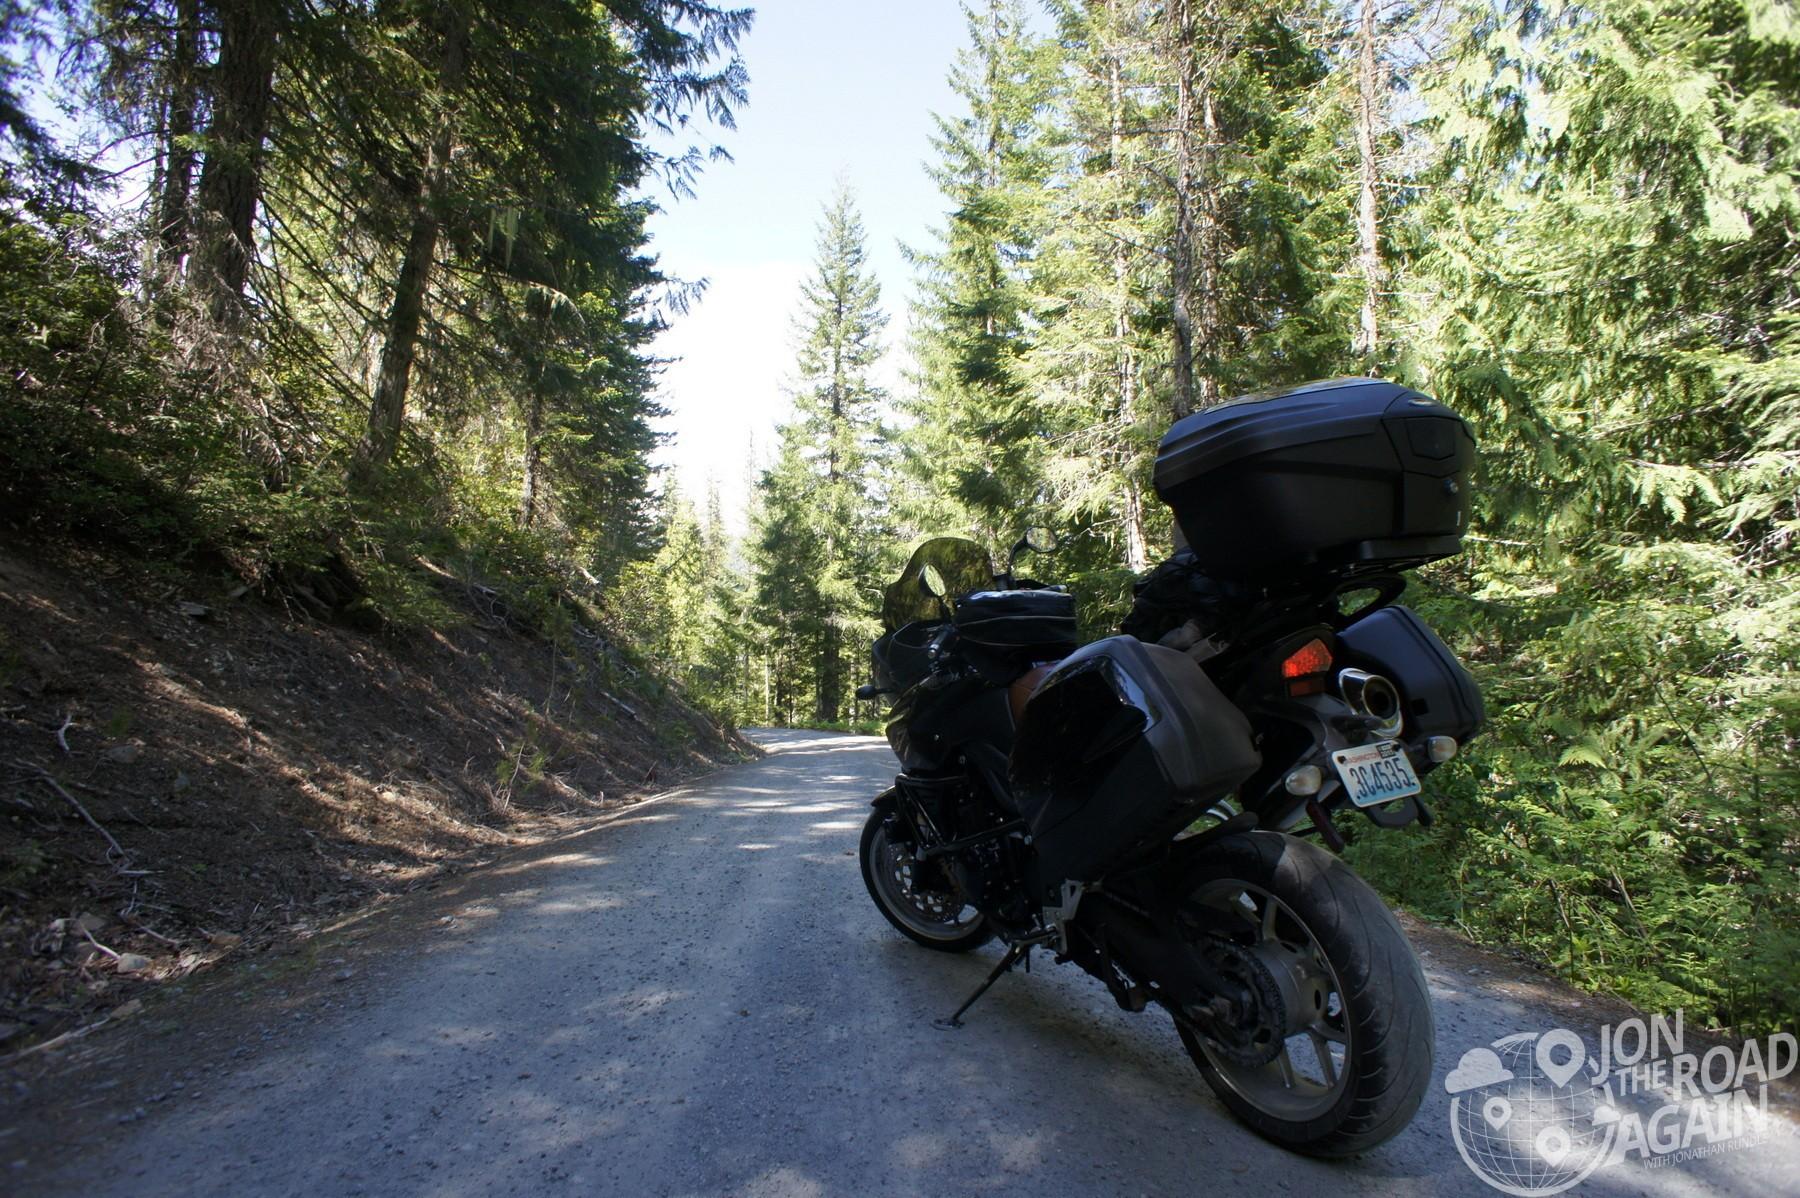 Campground Roads